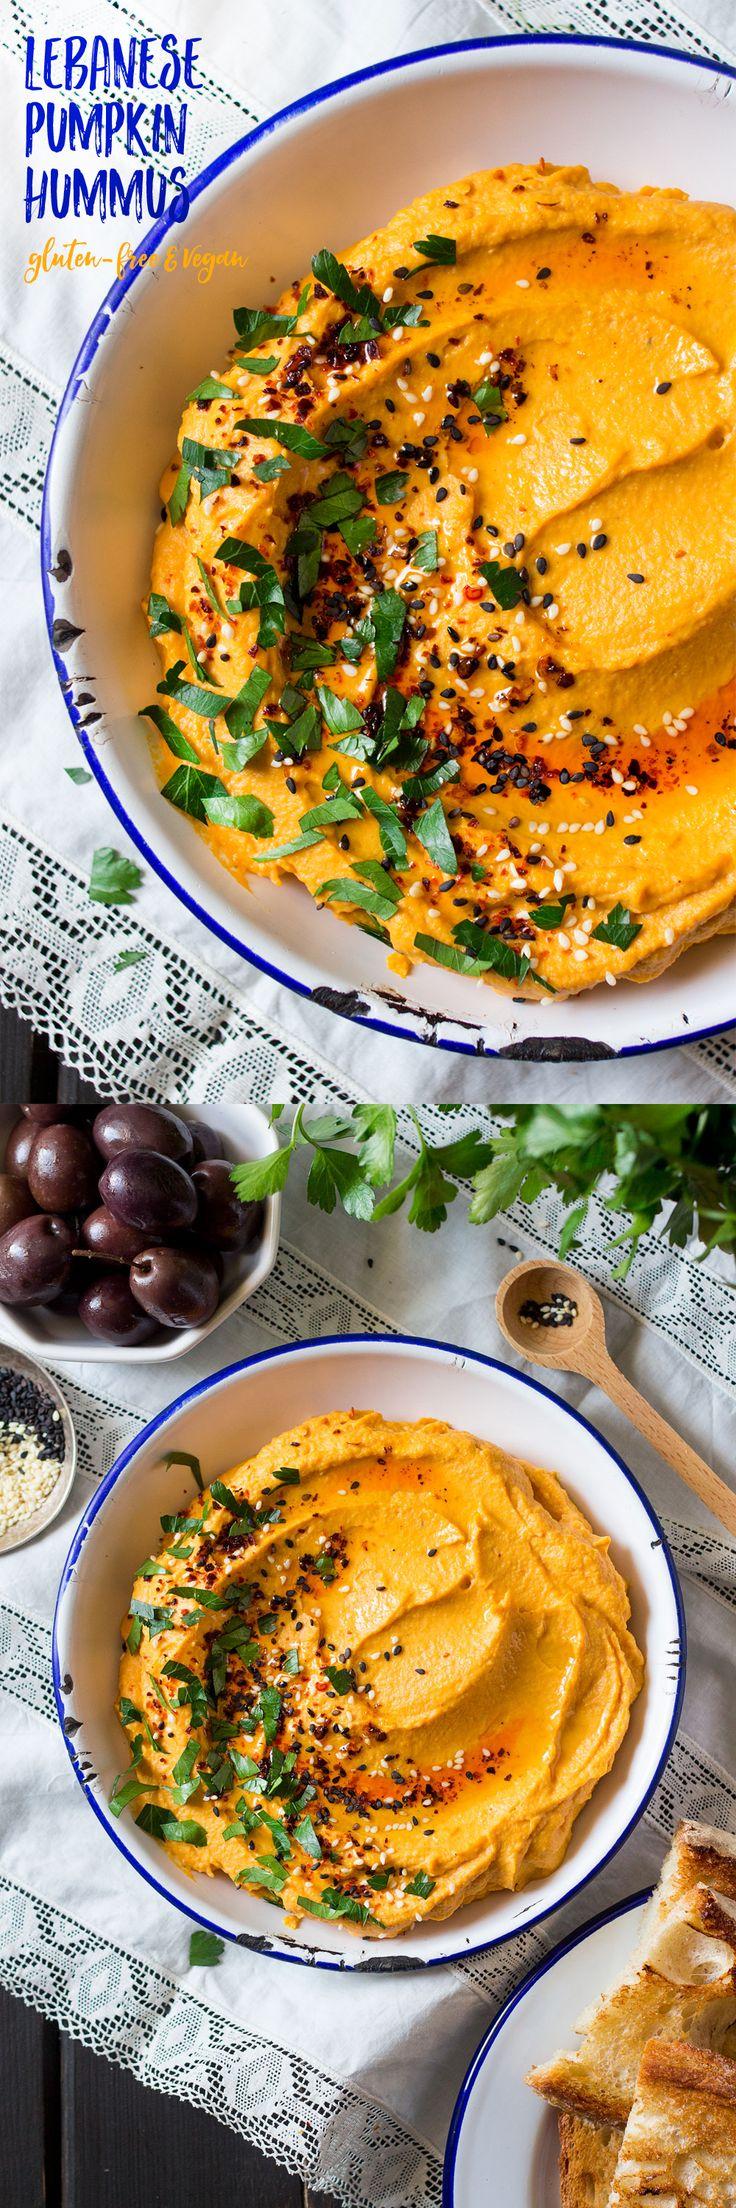 Pumpkin Hummus vegan & gluten-free recipe, YUM! – I Quit Sugar